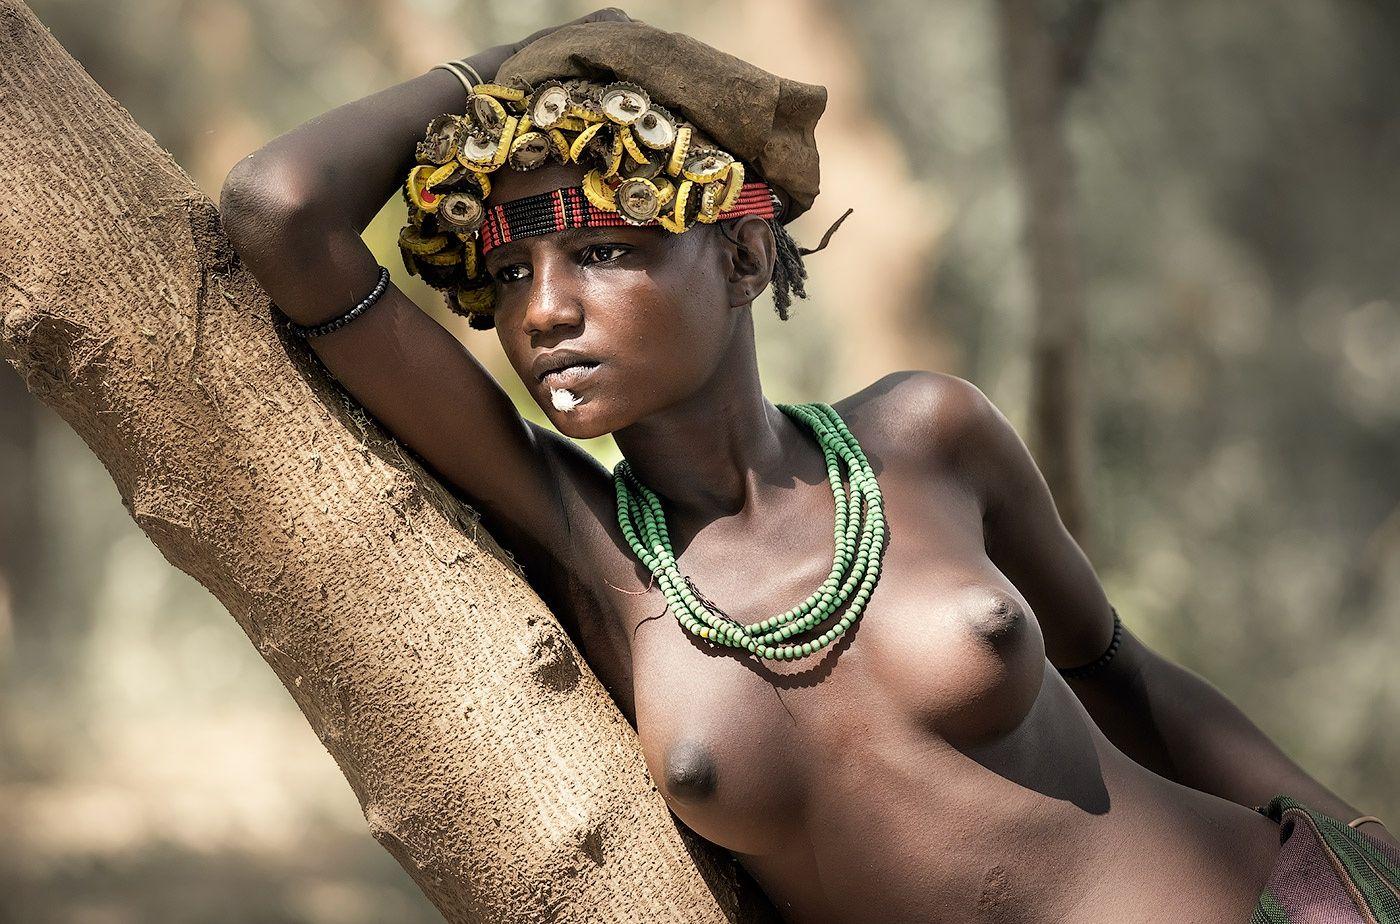 vlagalisha-devushek-iz-afrikanskih-plemen-pornuhu-smotret-i-skachivat